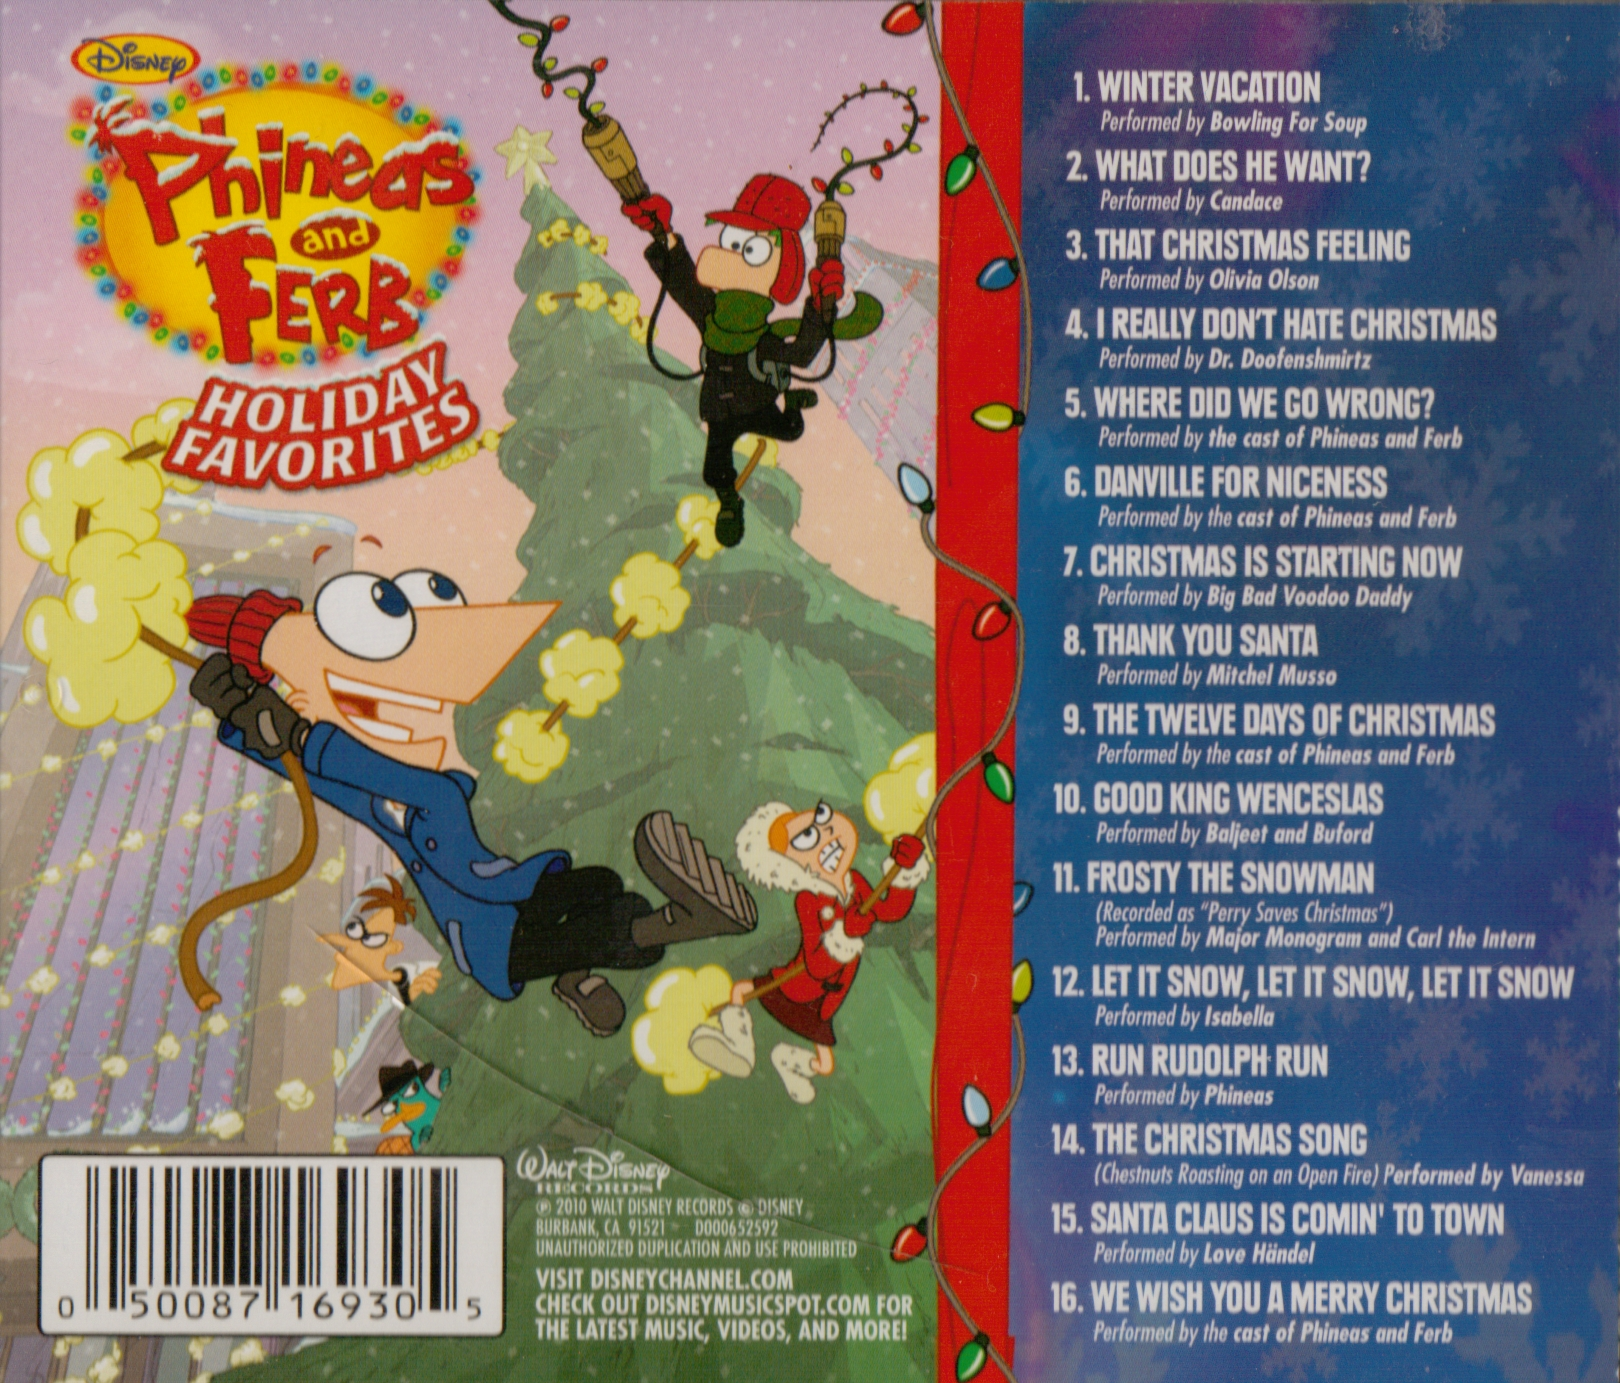 Image - HF ADVERT 3.jpg | Phineas and Ferb Wiki | FANDOM powered ...